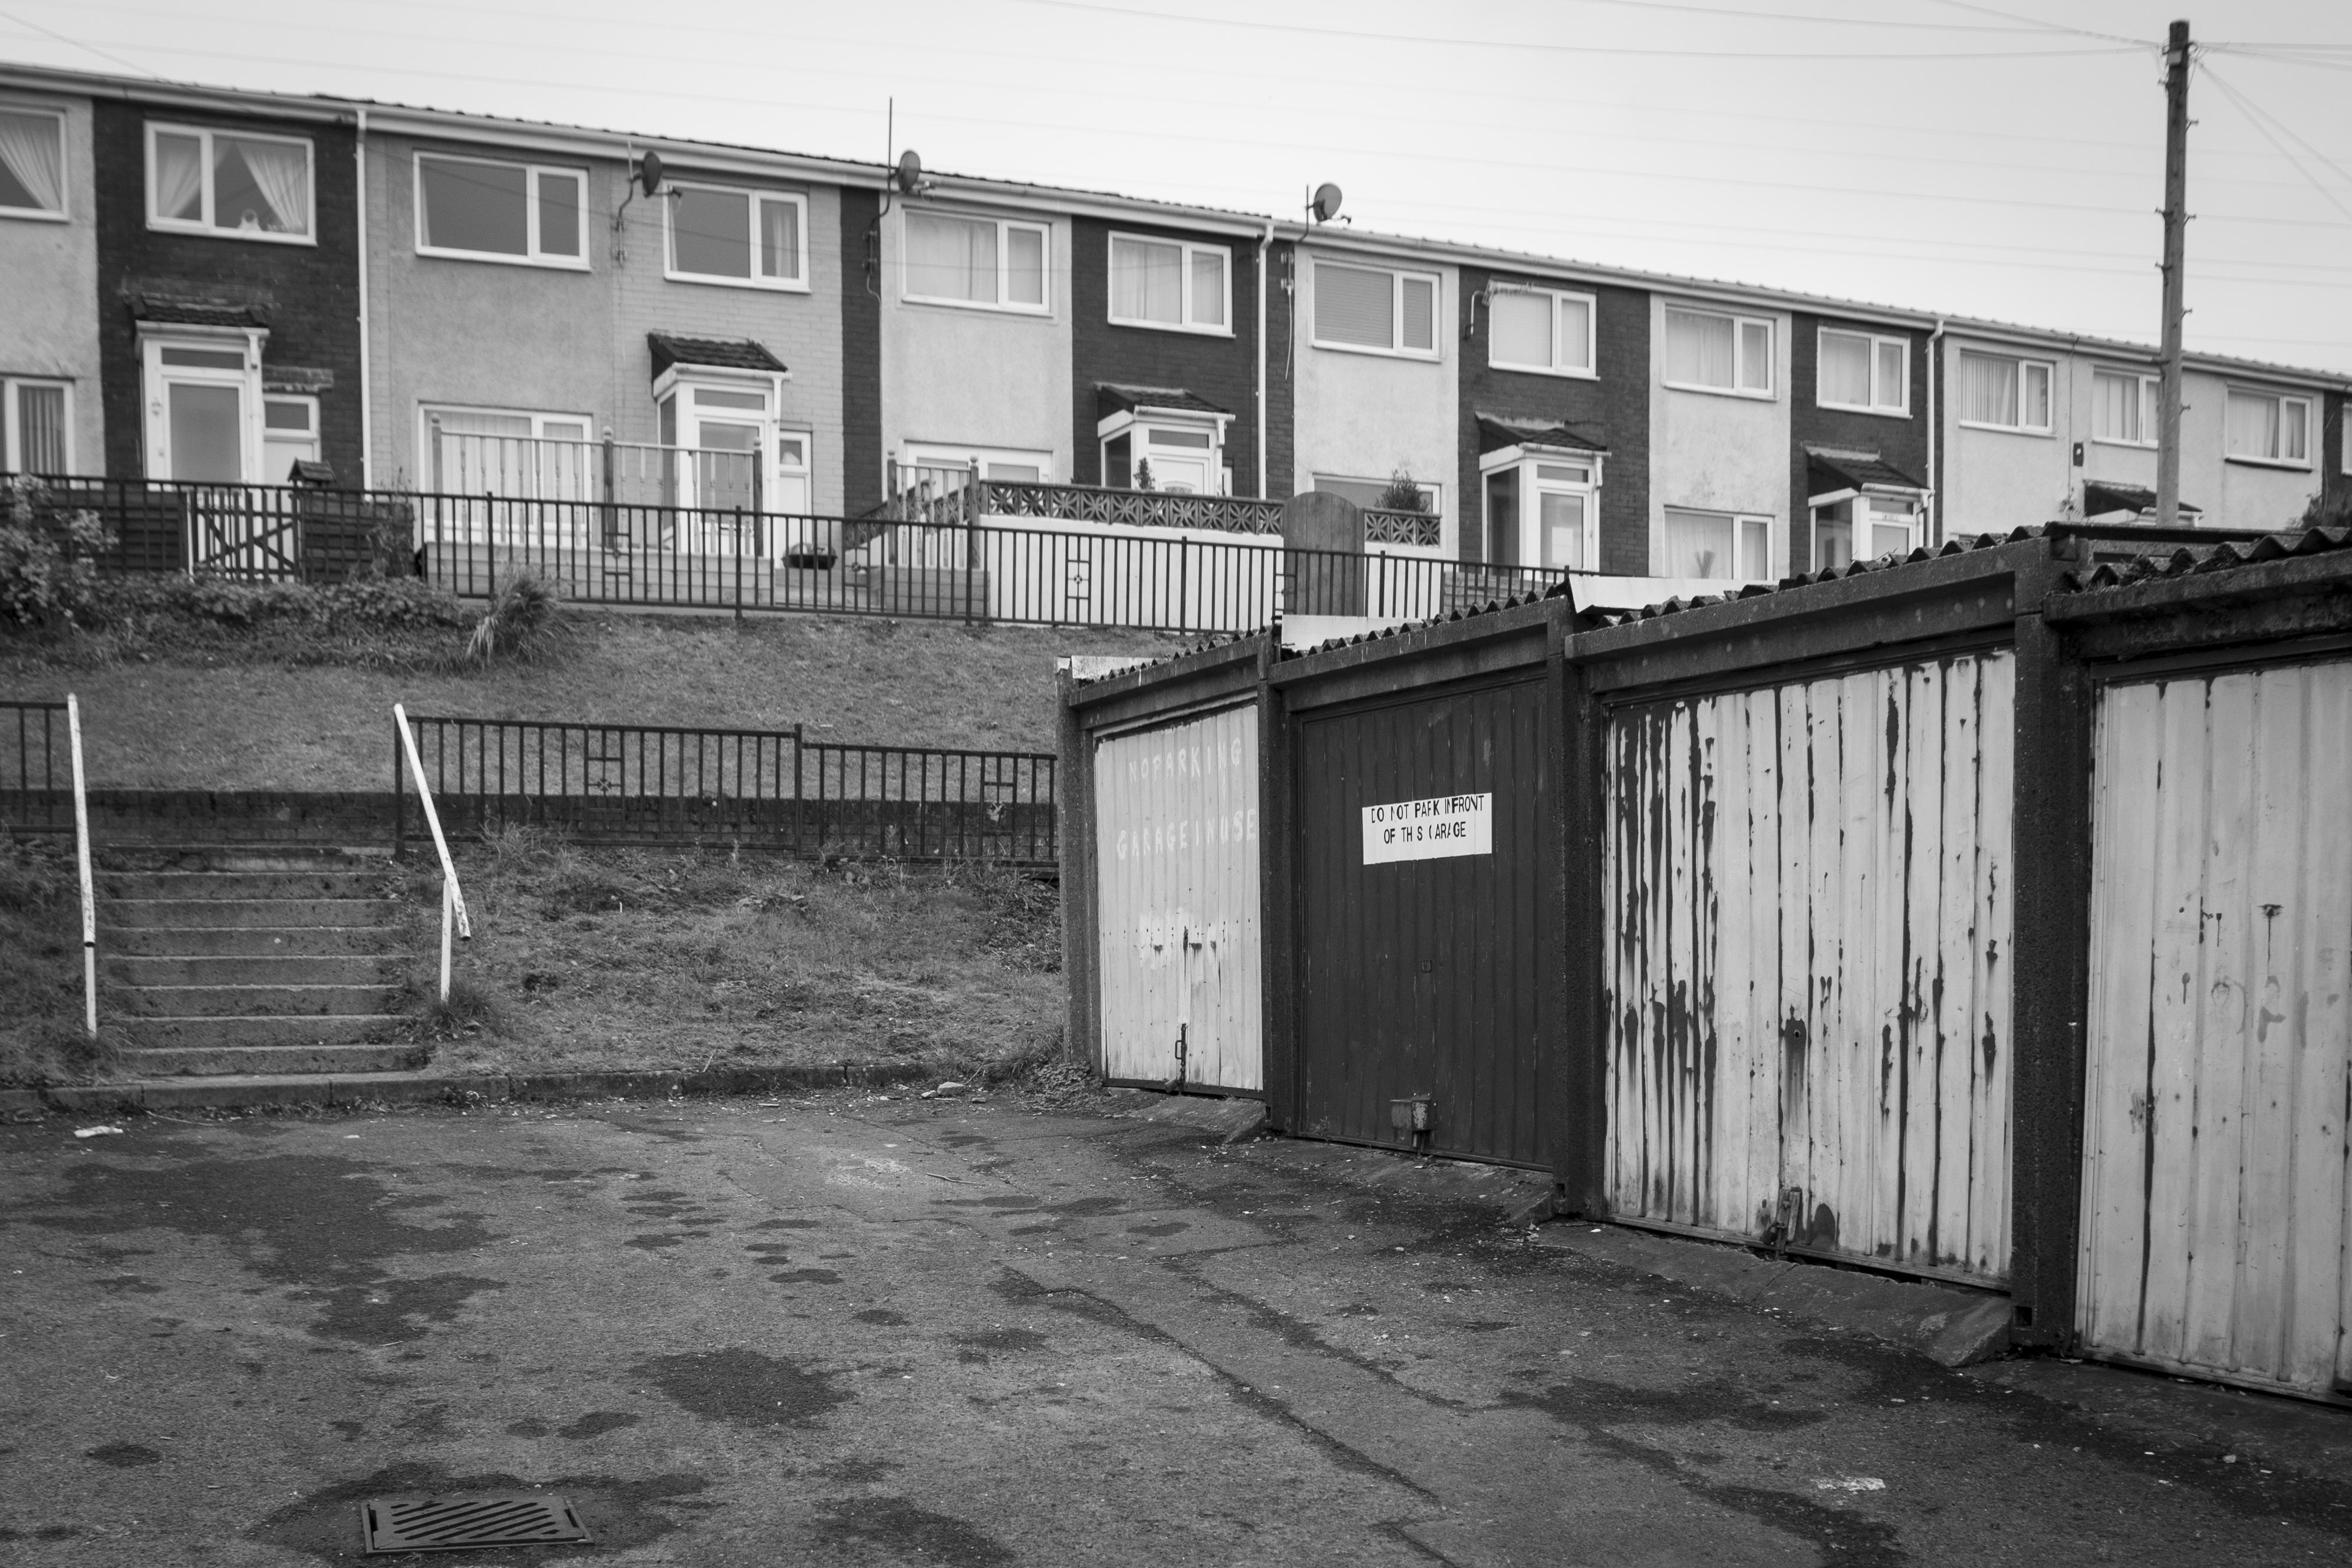 Neighbourhood renewal 2 - Professional Consultation